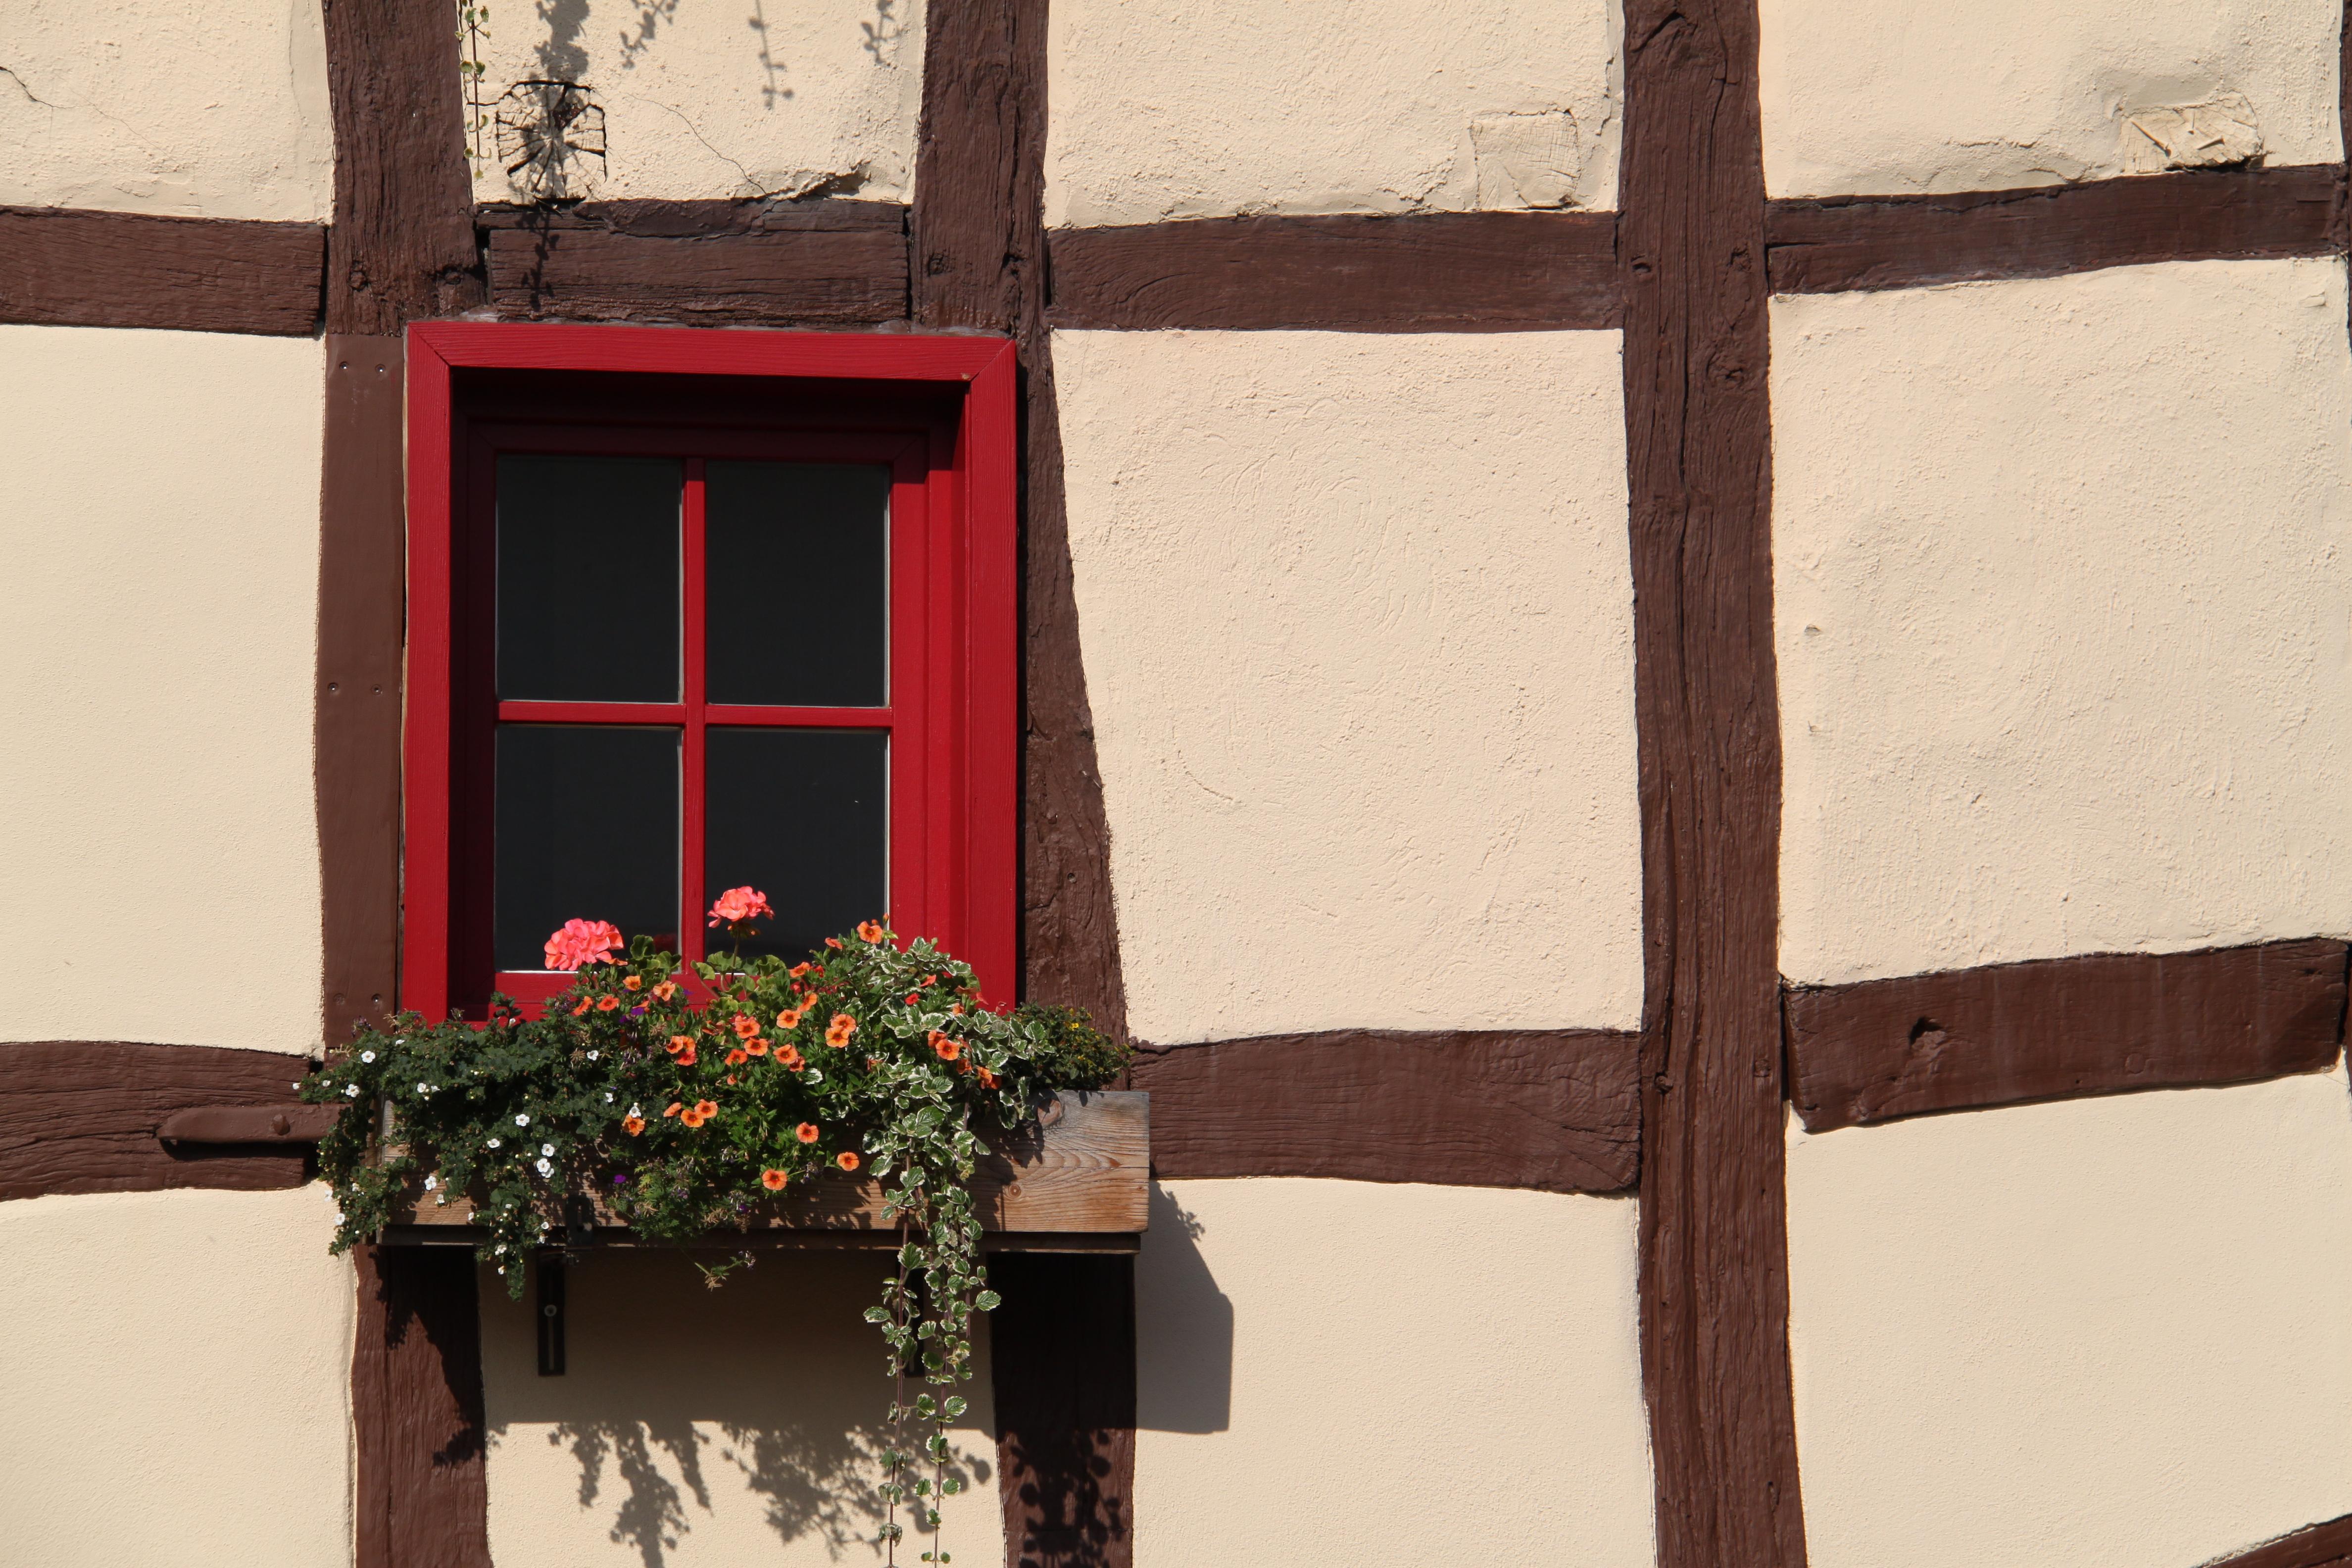 Fenster Fachwerkhaus file fenster fachwerkhaus jpg wikimedia commons